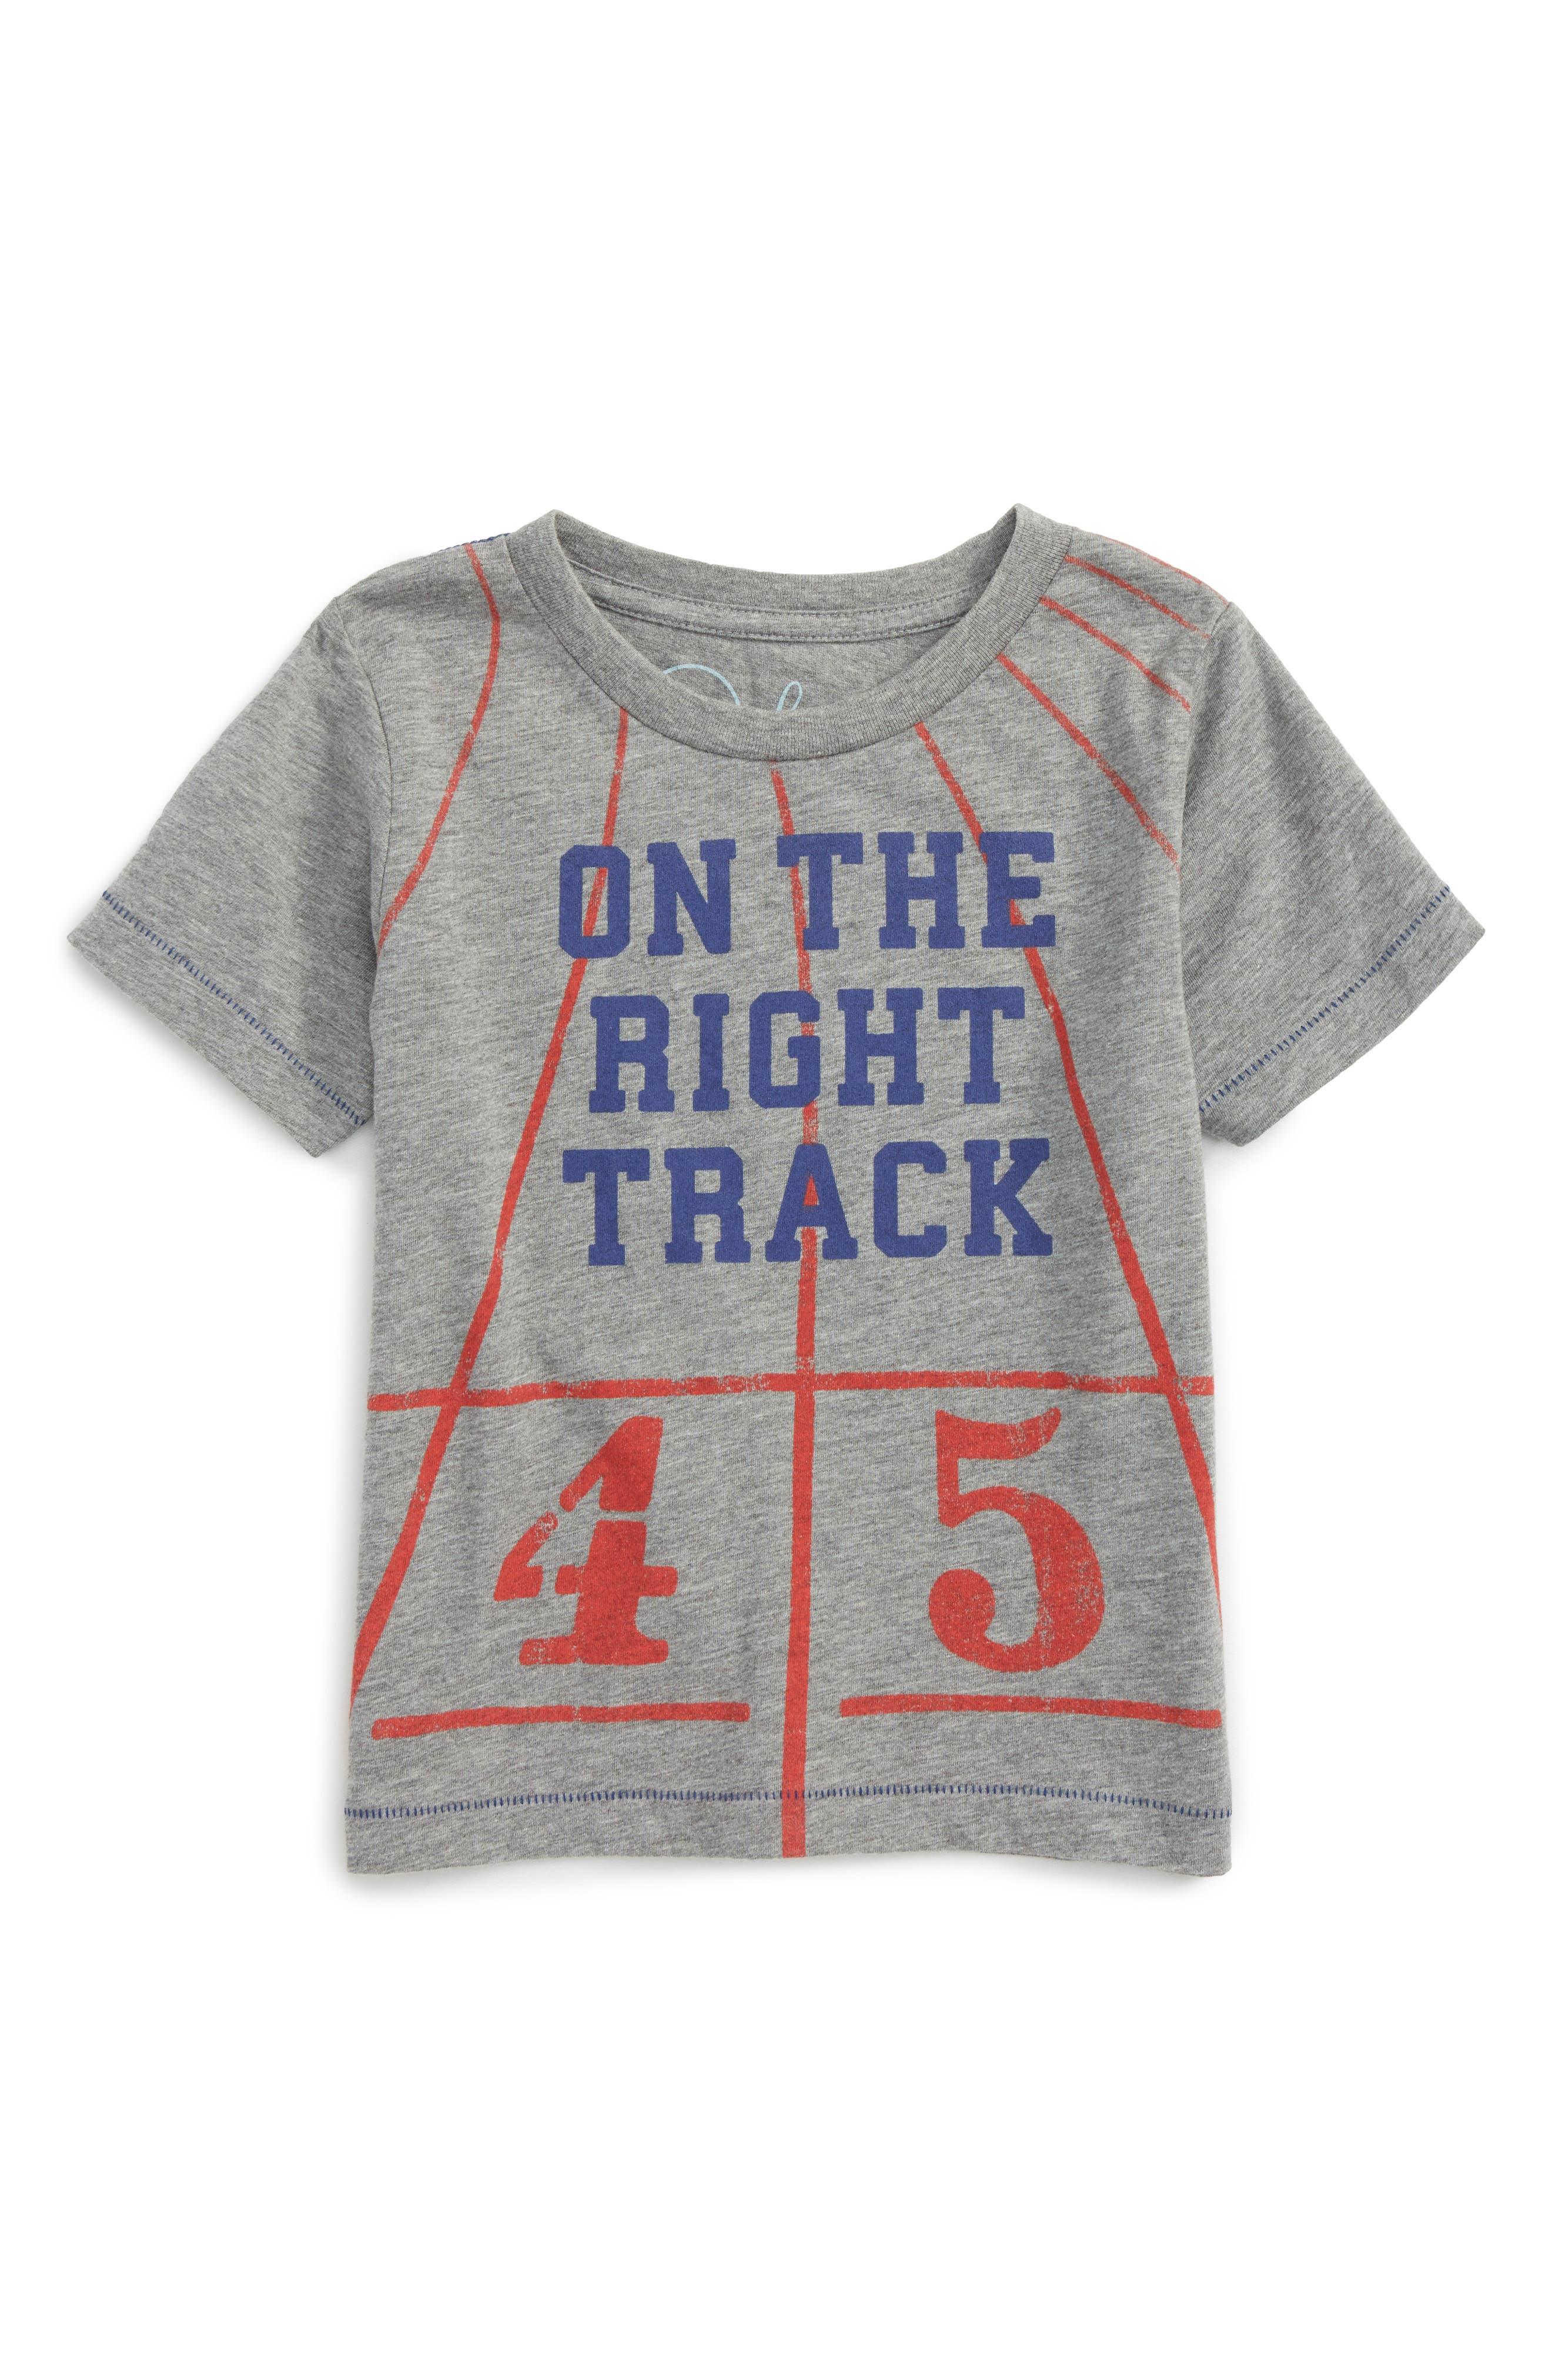 Main Image - Peek On the Right Track Graphic T-Shirt (Toddler Boys, Little Boys & Big Boys)